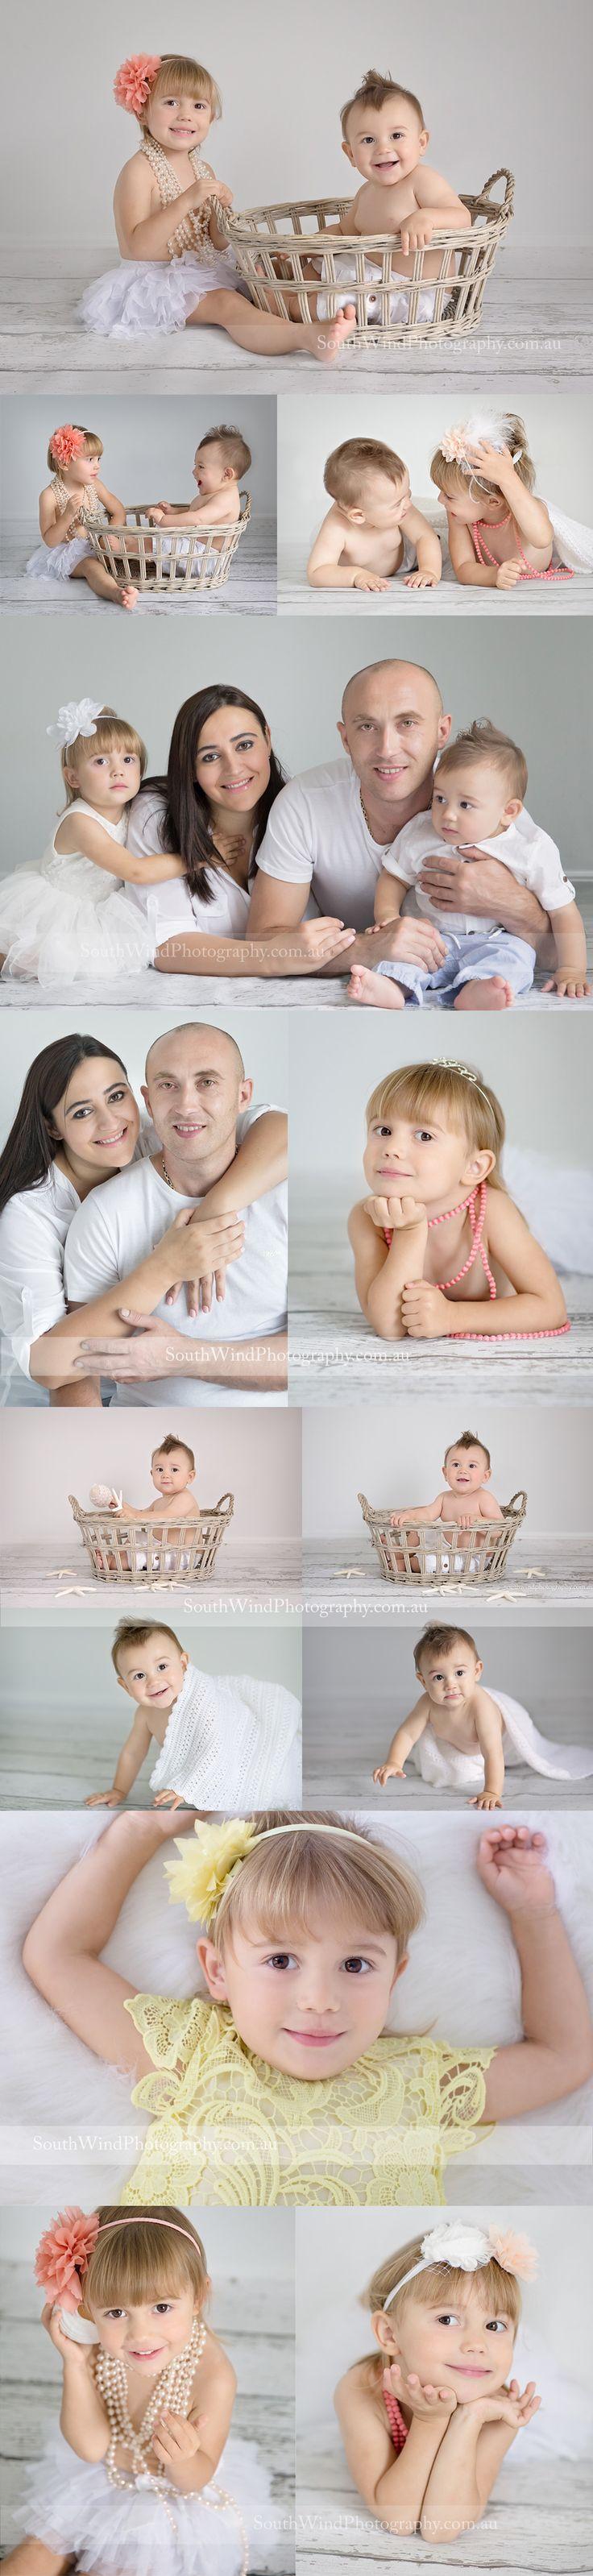 The C family's portraits #sydney #centralcoast #sylvania #family #siblings #portrait